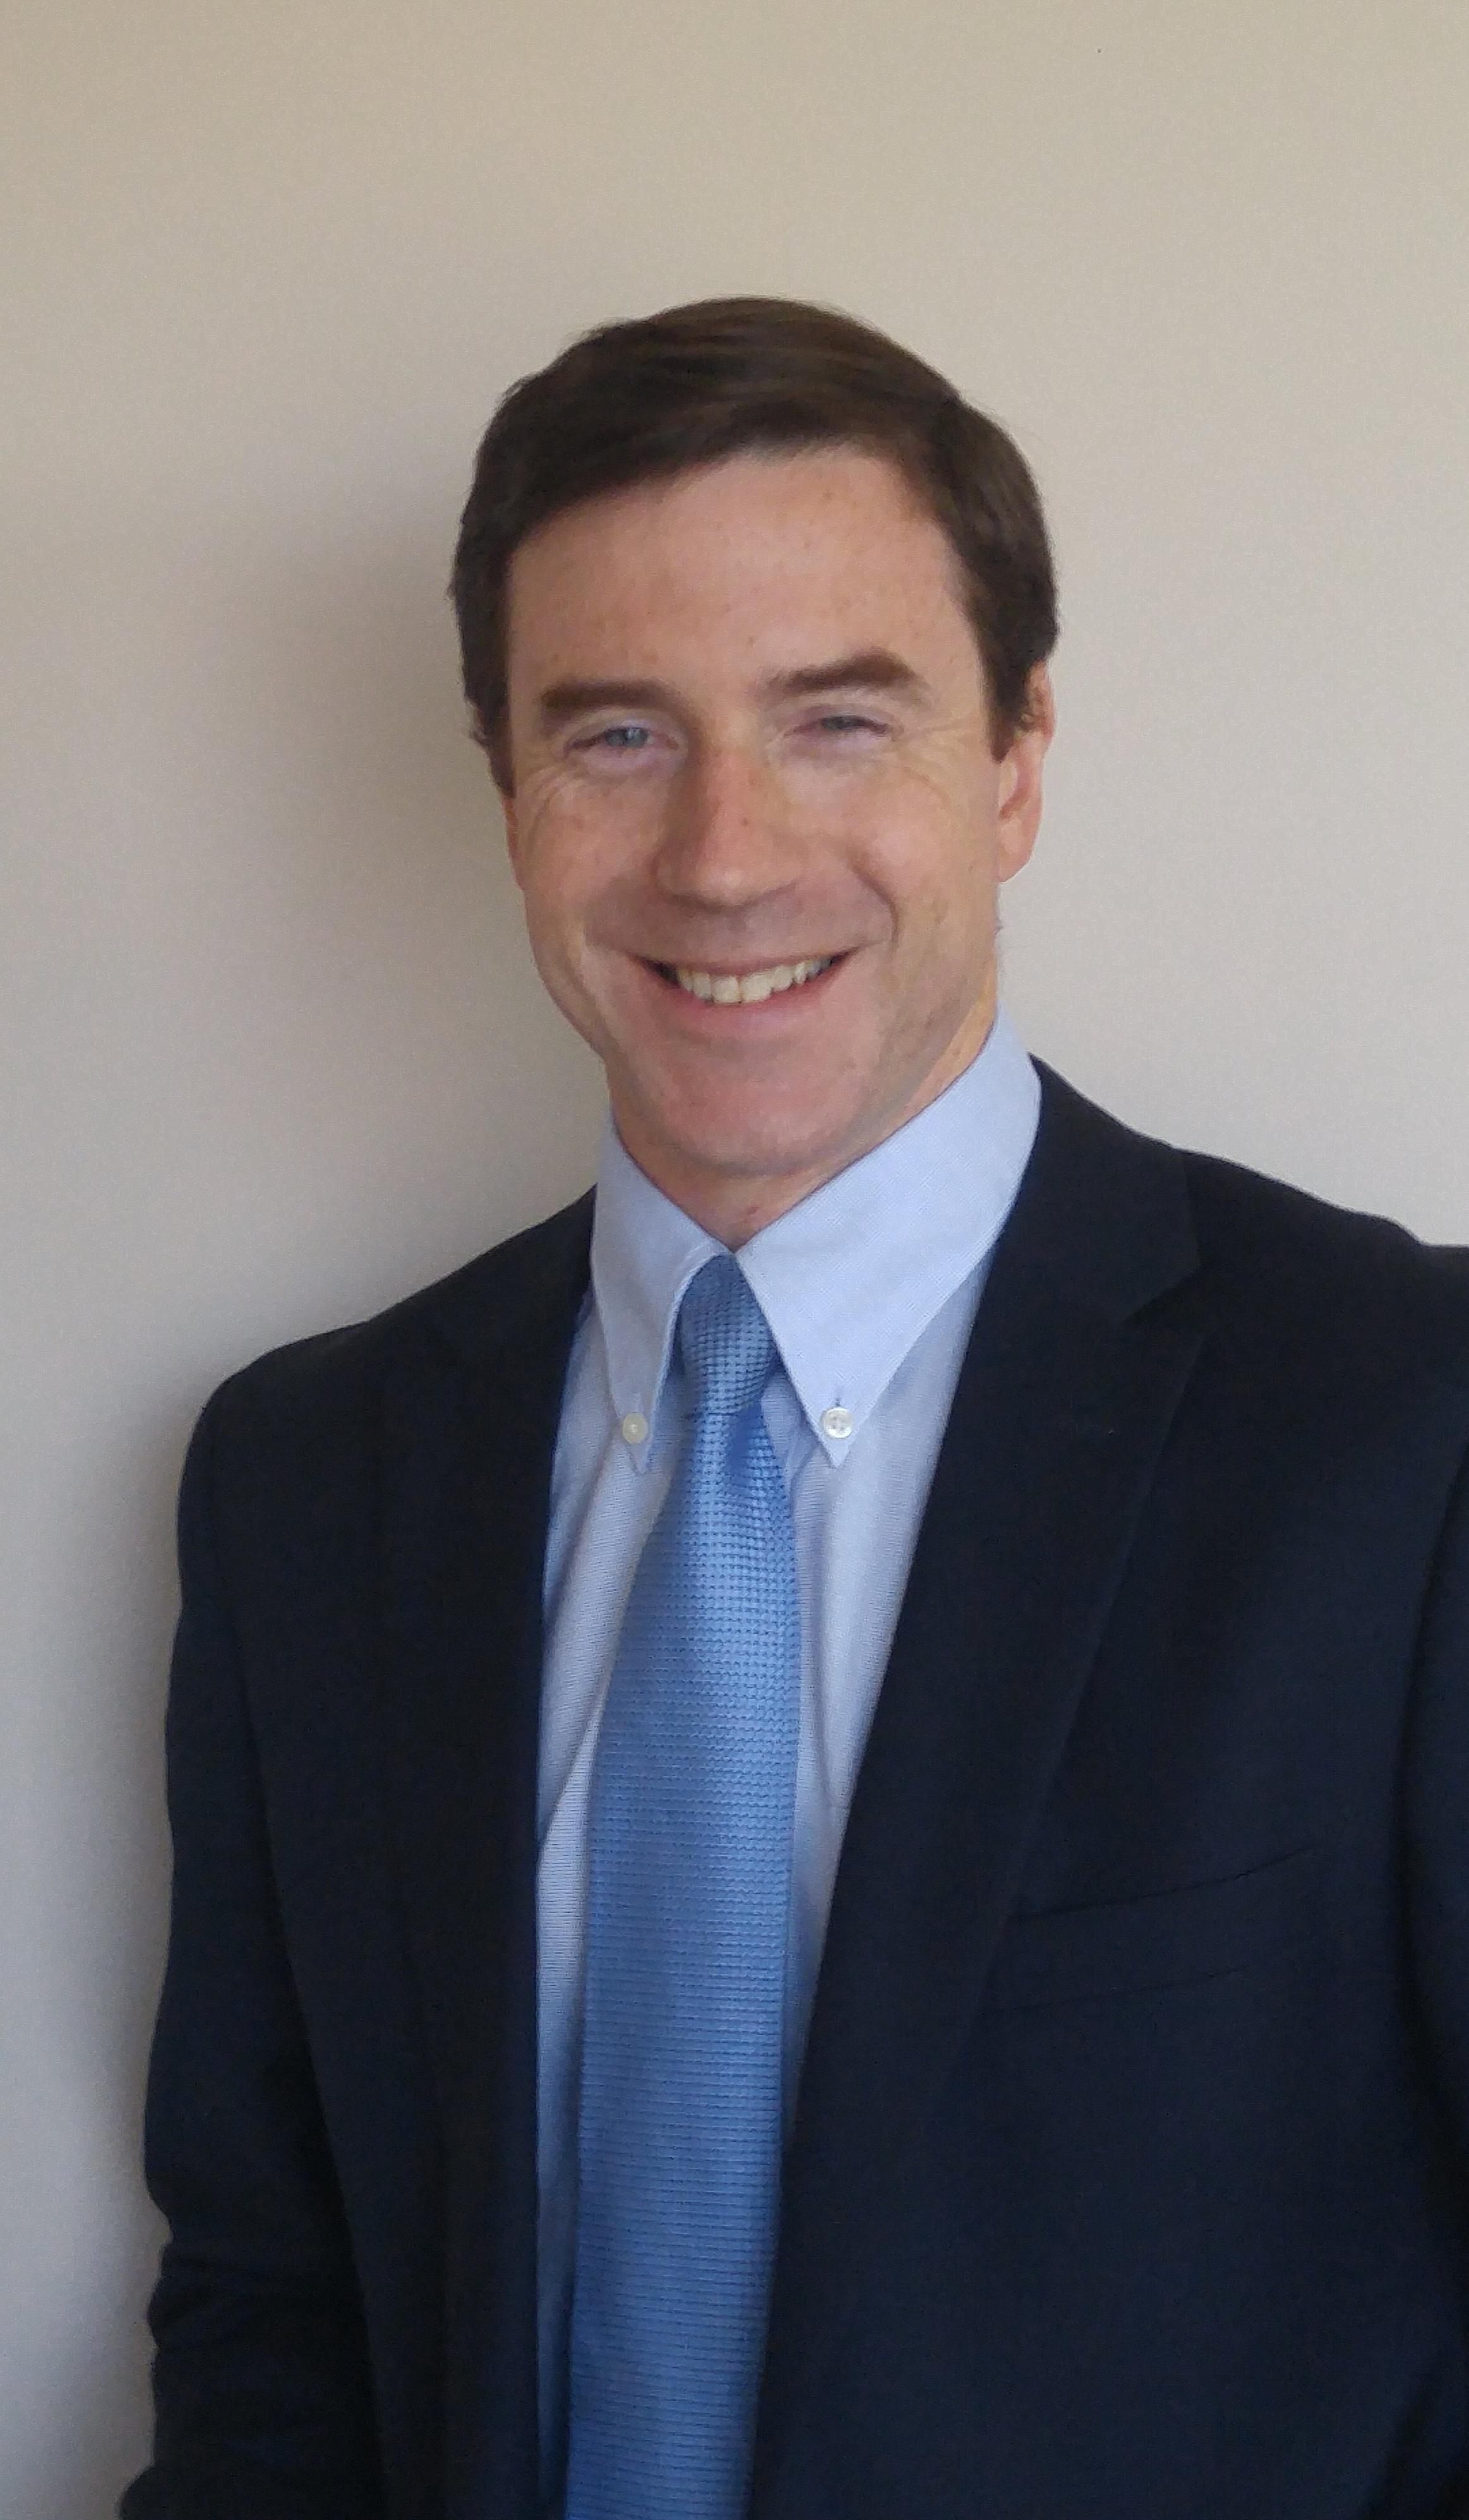 Andrew Malone